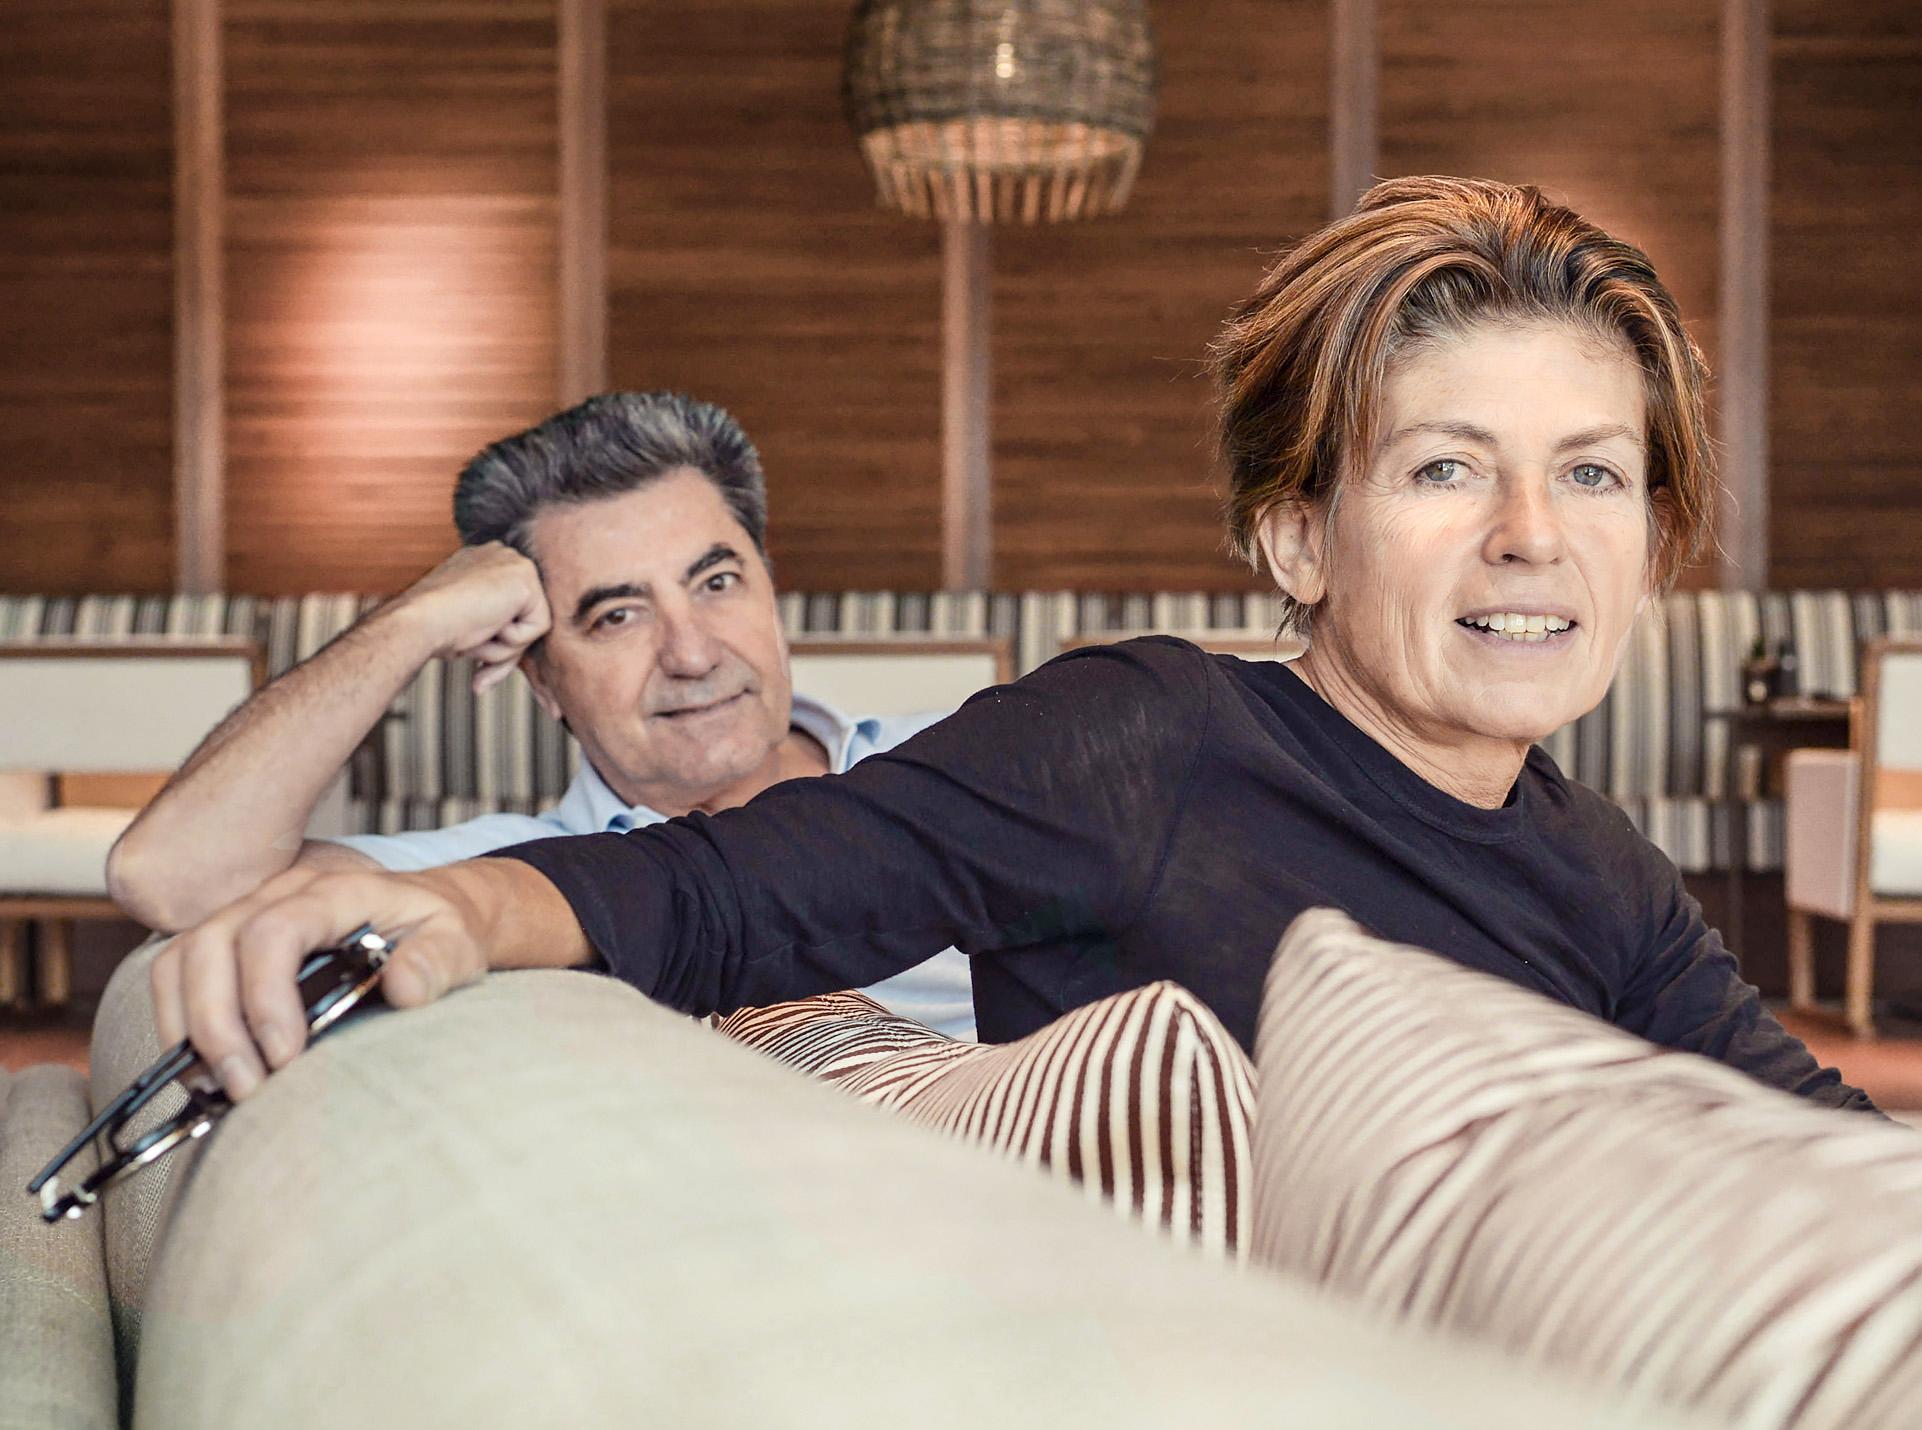 The designers: Antonio Citterio & Patricia Viel